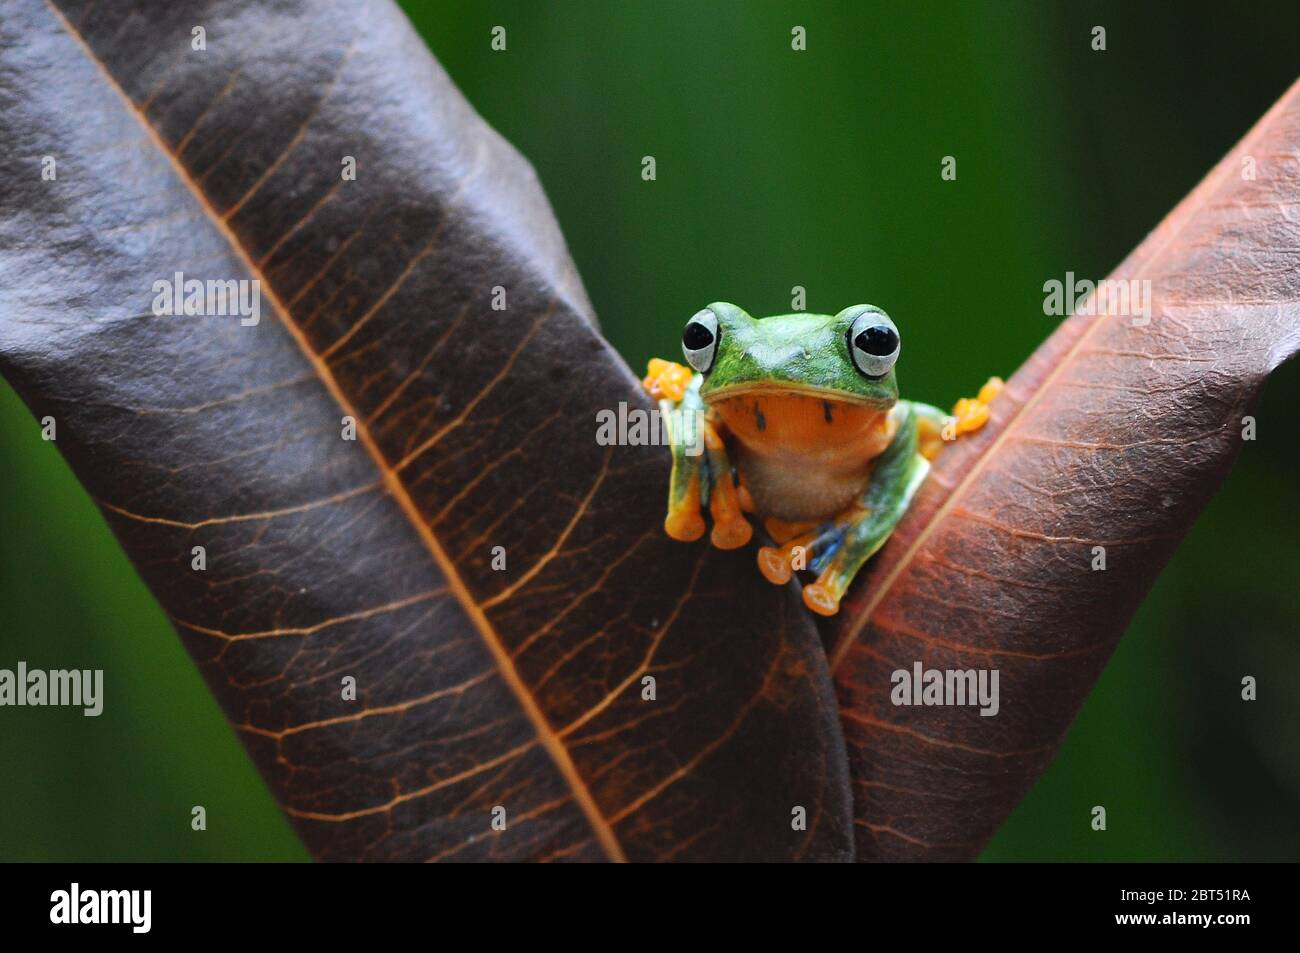 Dumpy tree frog on a leaf, Indonesia Stock Photo